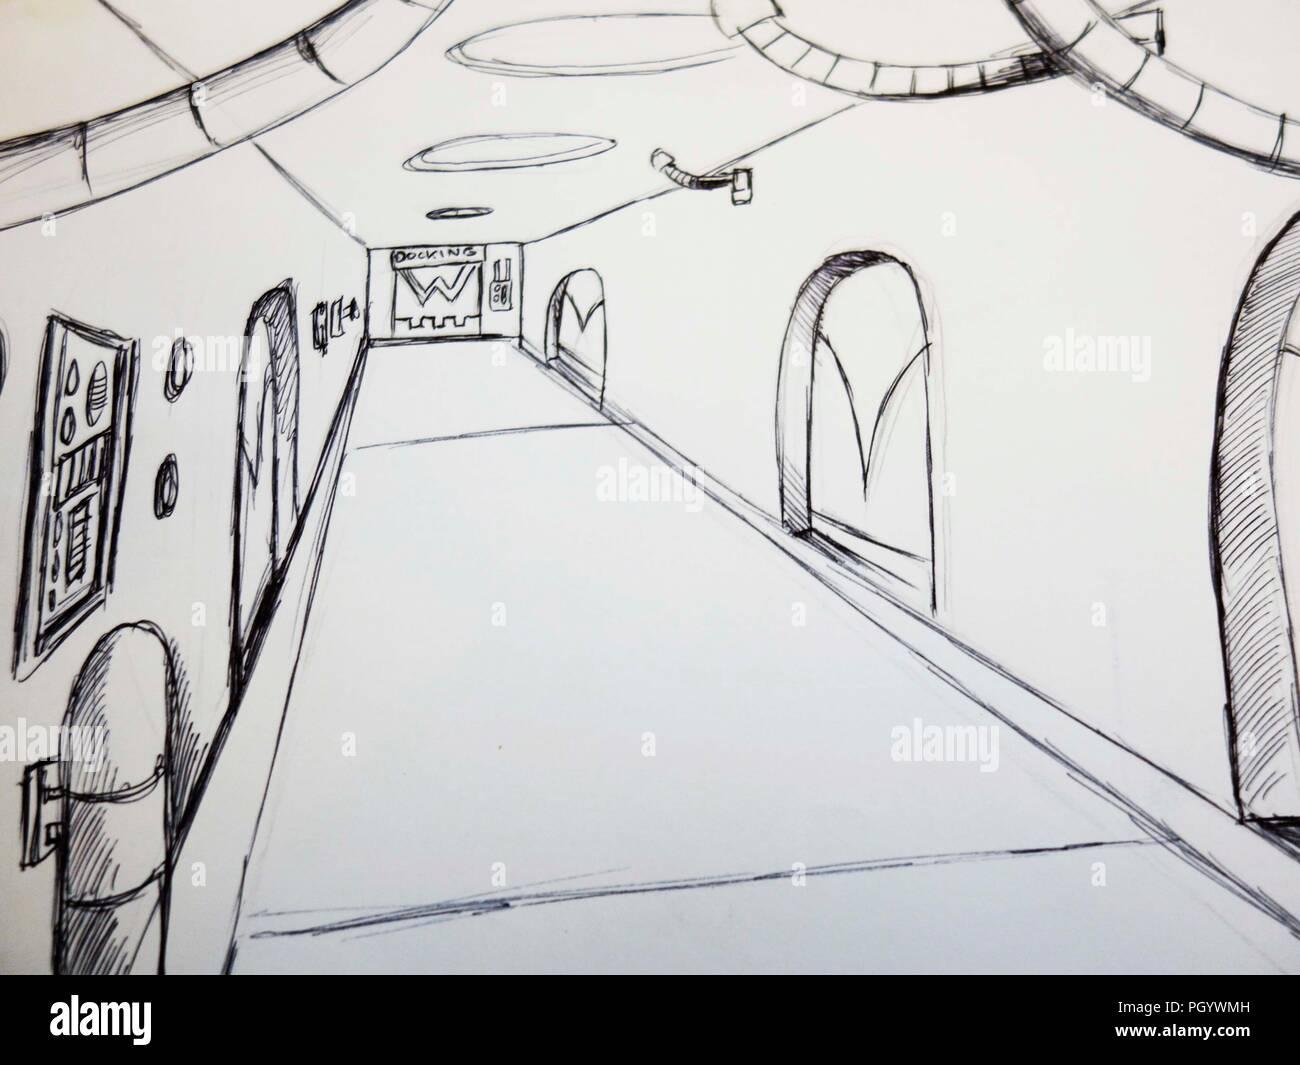 scifi corridor - Stock Image